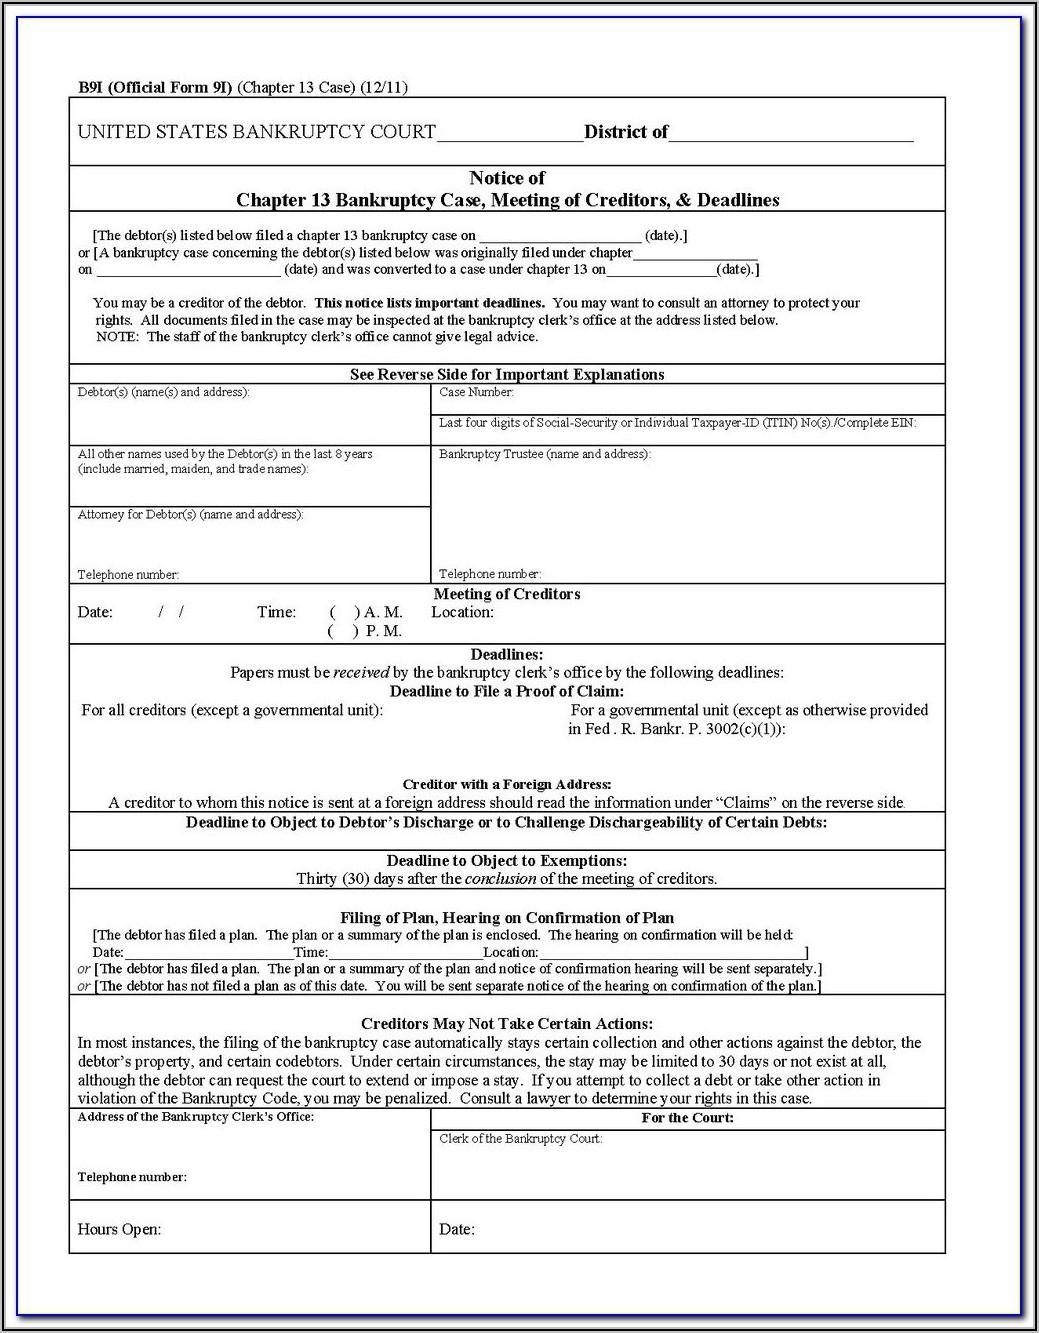 Creditor's Claim Form Washington State